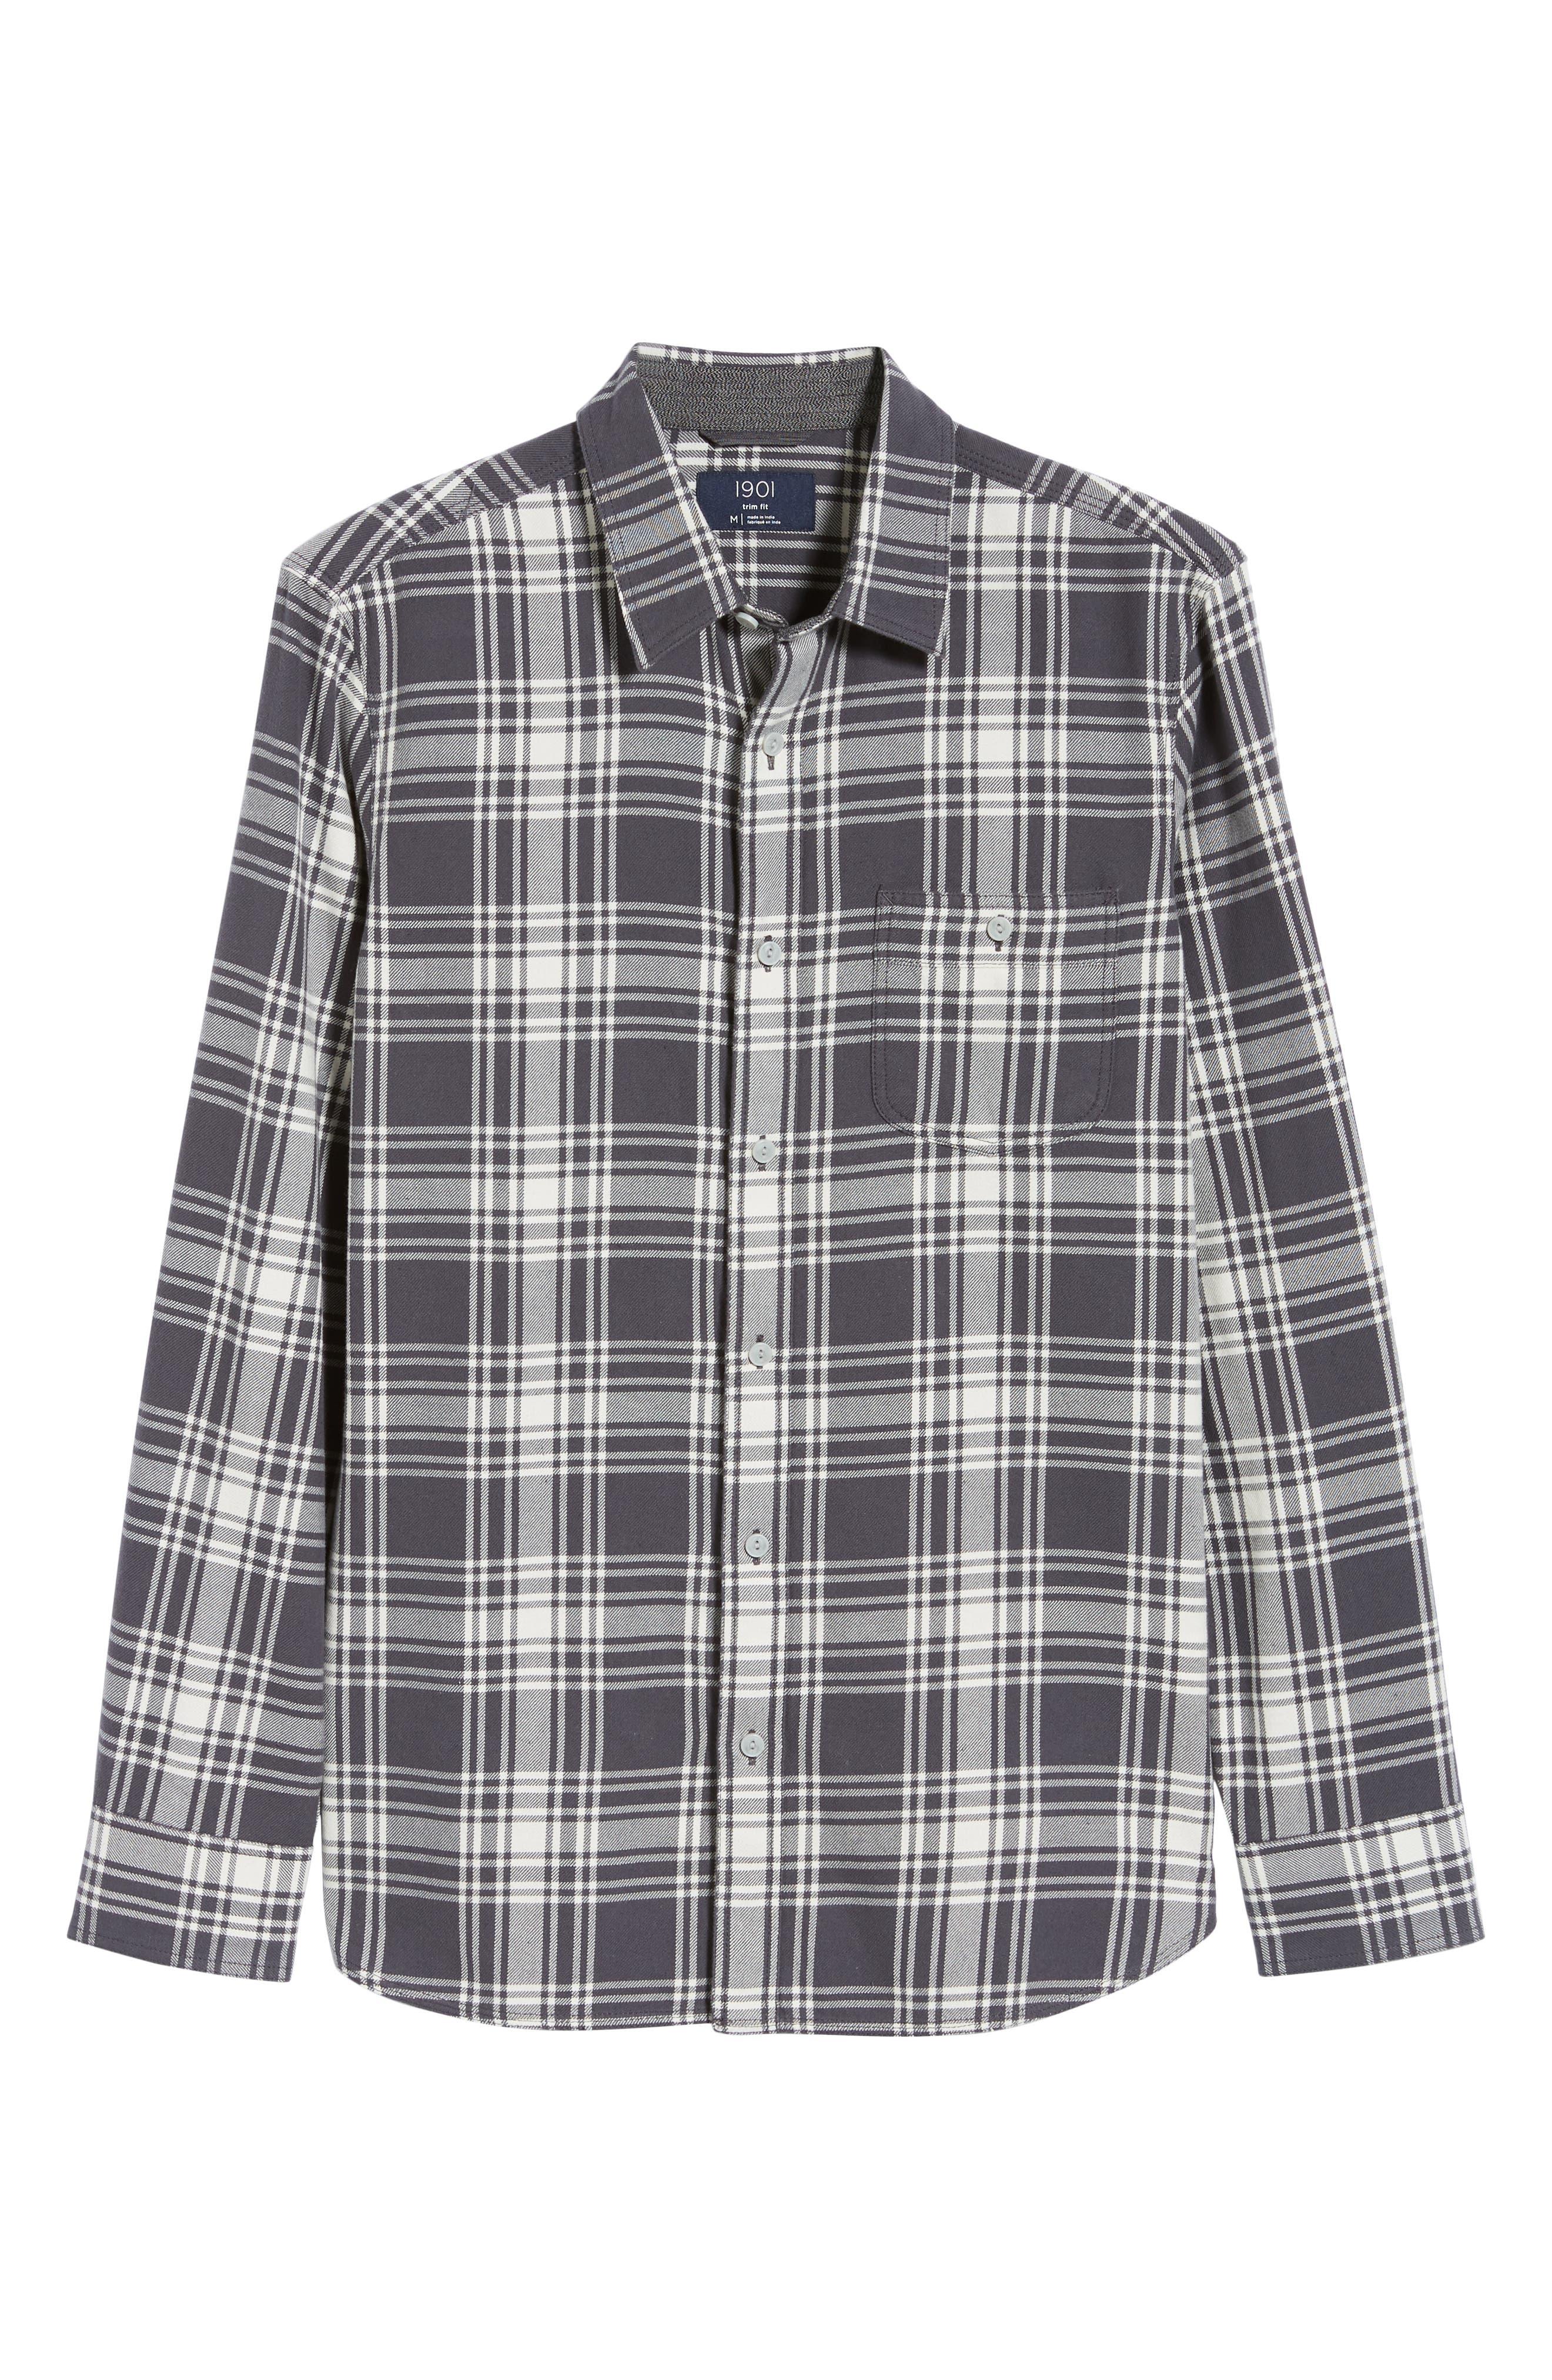 Plaid Utility Long Sleeve Trim Fit Sport Shirt,                             Alternate thumbnail 6, color,                             GREY CASTLEROCK PLAID